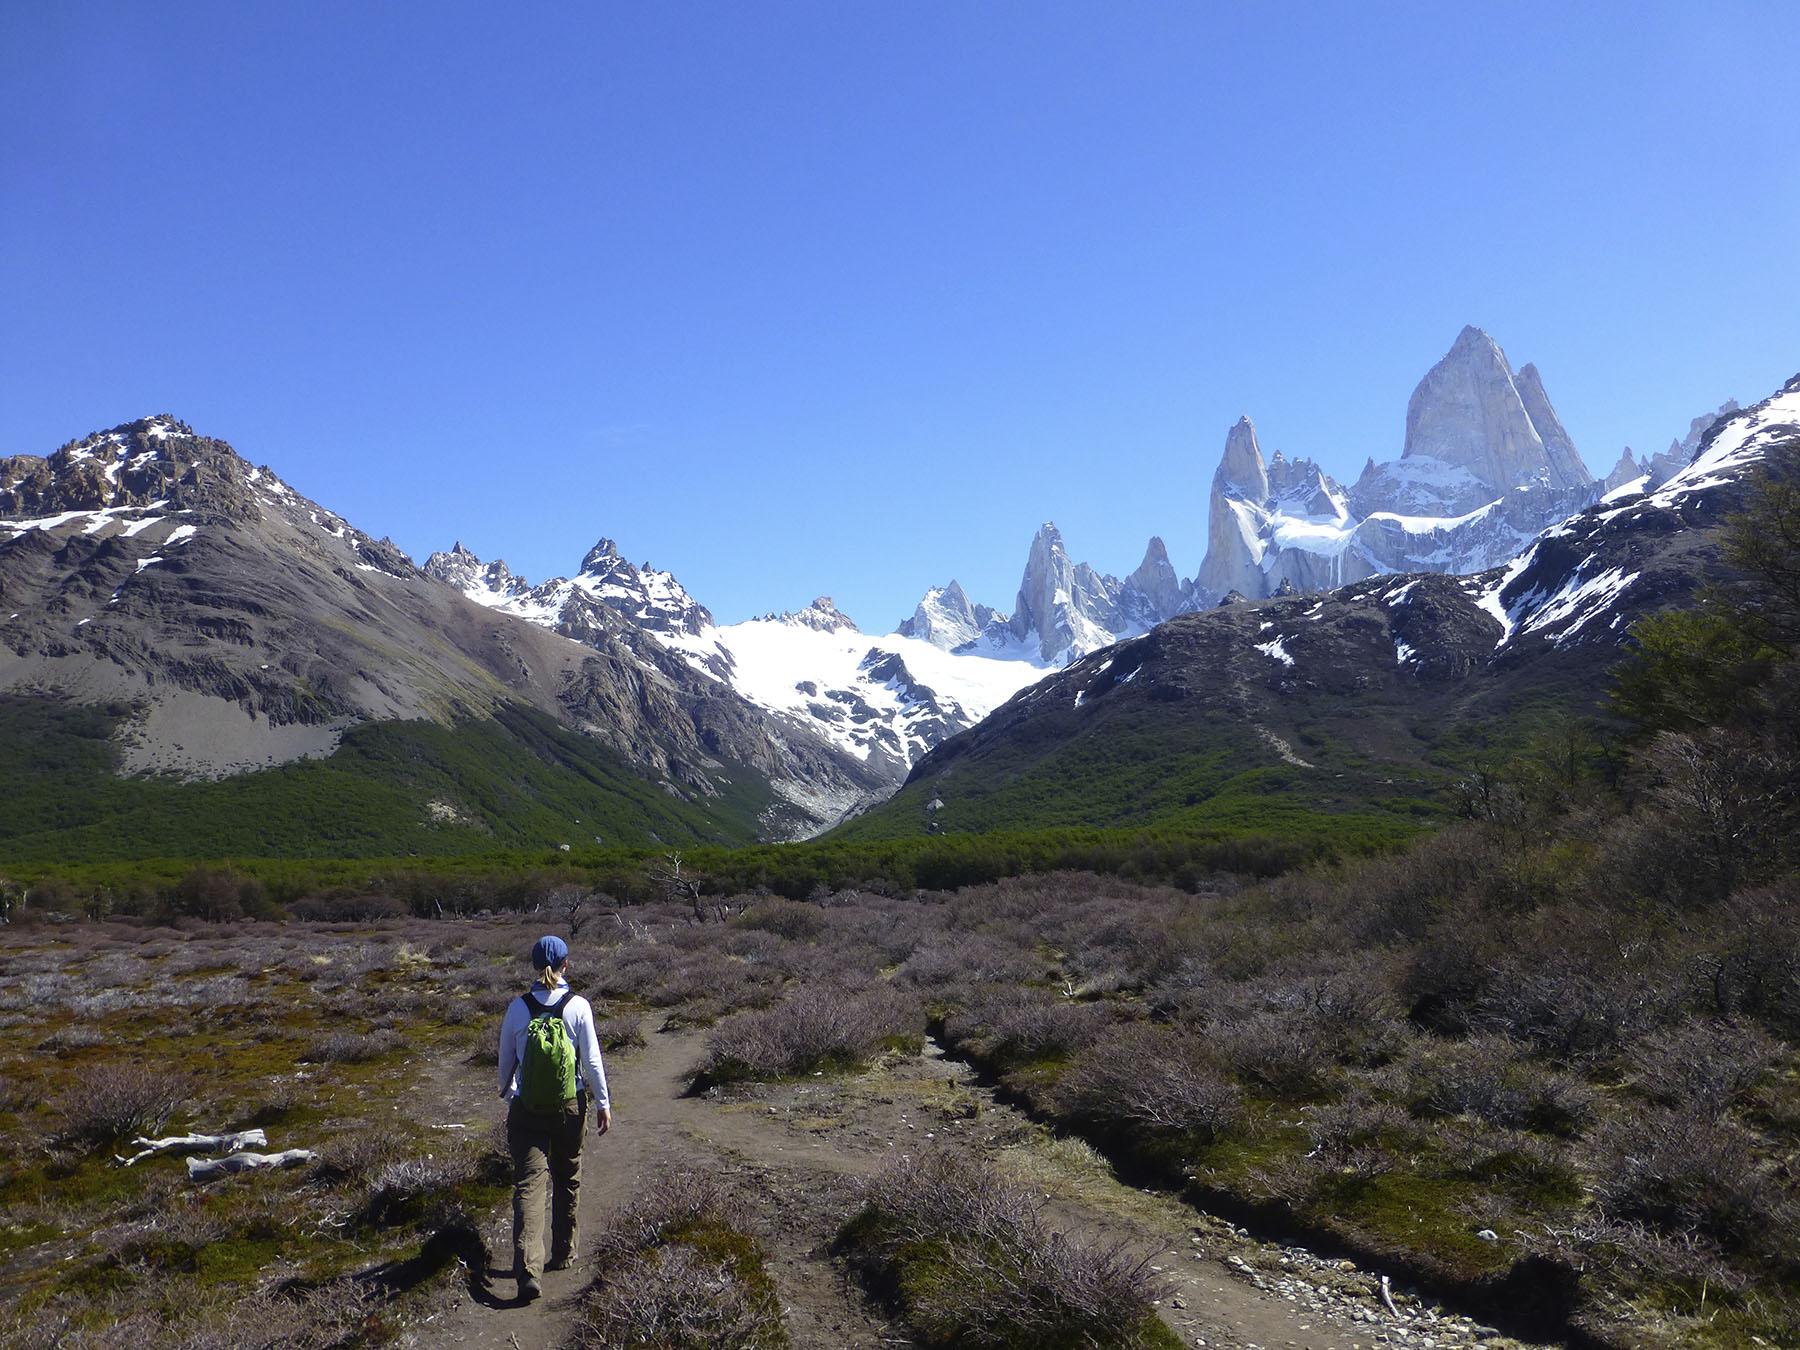 Where Desert Terrain Meets Alpine Scenery